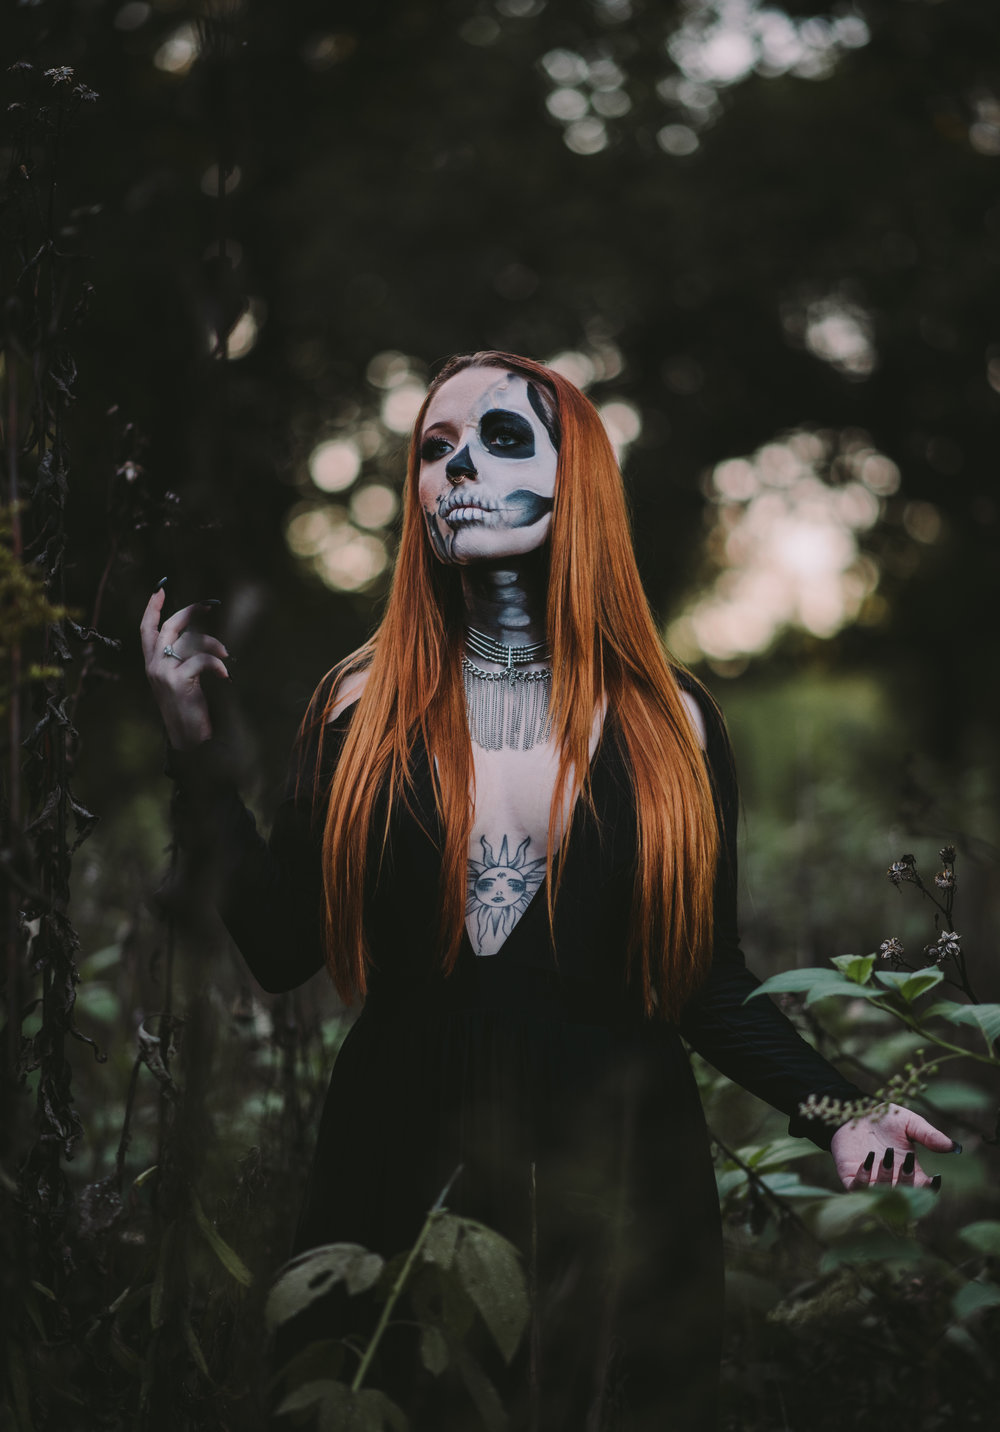 HalloweenSession_Fridaythe13th_October2017_IndianaPortraitPhotographer_SamanthaRosePhotography_--2.jpg